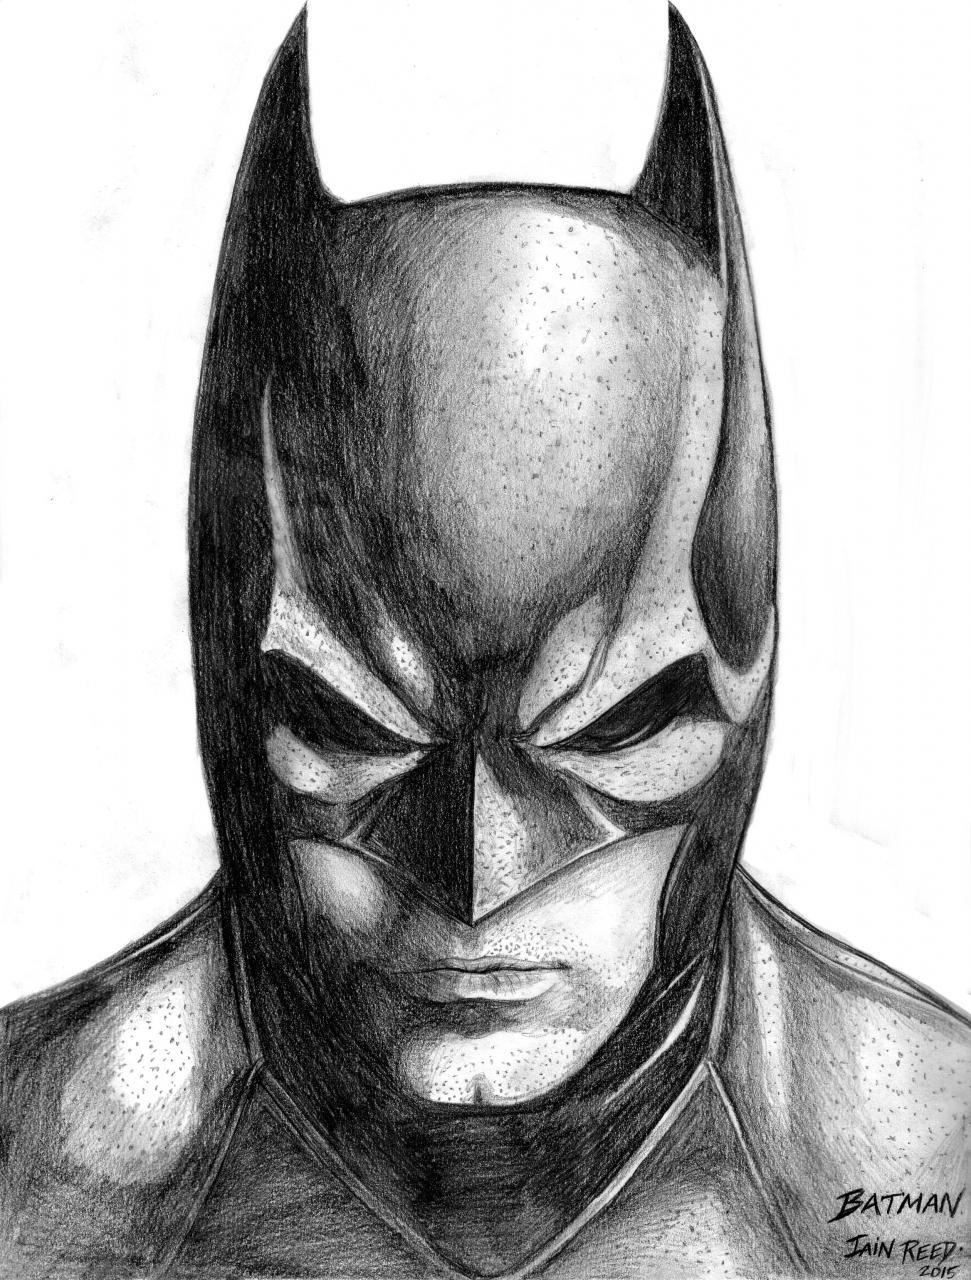 batman__dawn_of_justice__by_soulstryder210-d8p75sm - jpg 2 520×3 320 píxeles   Dibujos realistas  Superheroes dibujos  Batman dibujo, dibujos de A Batman Realista, como dibujar A Batman Realista paso a paso